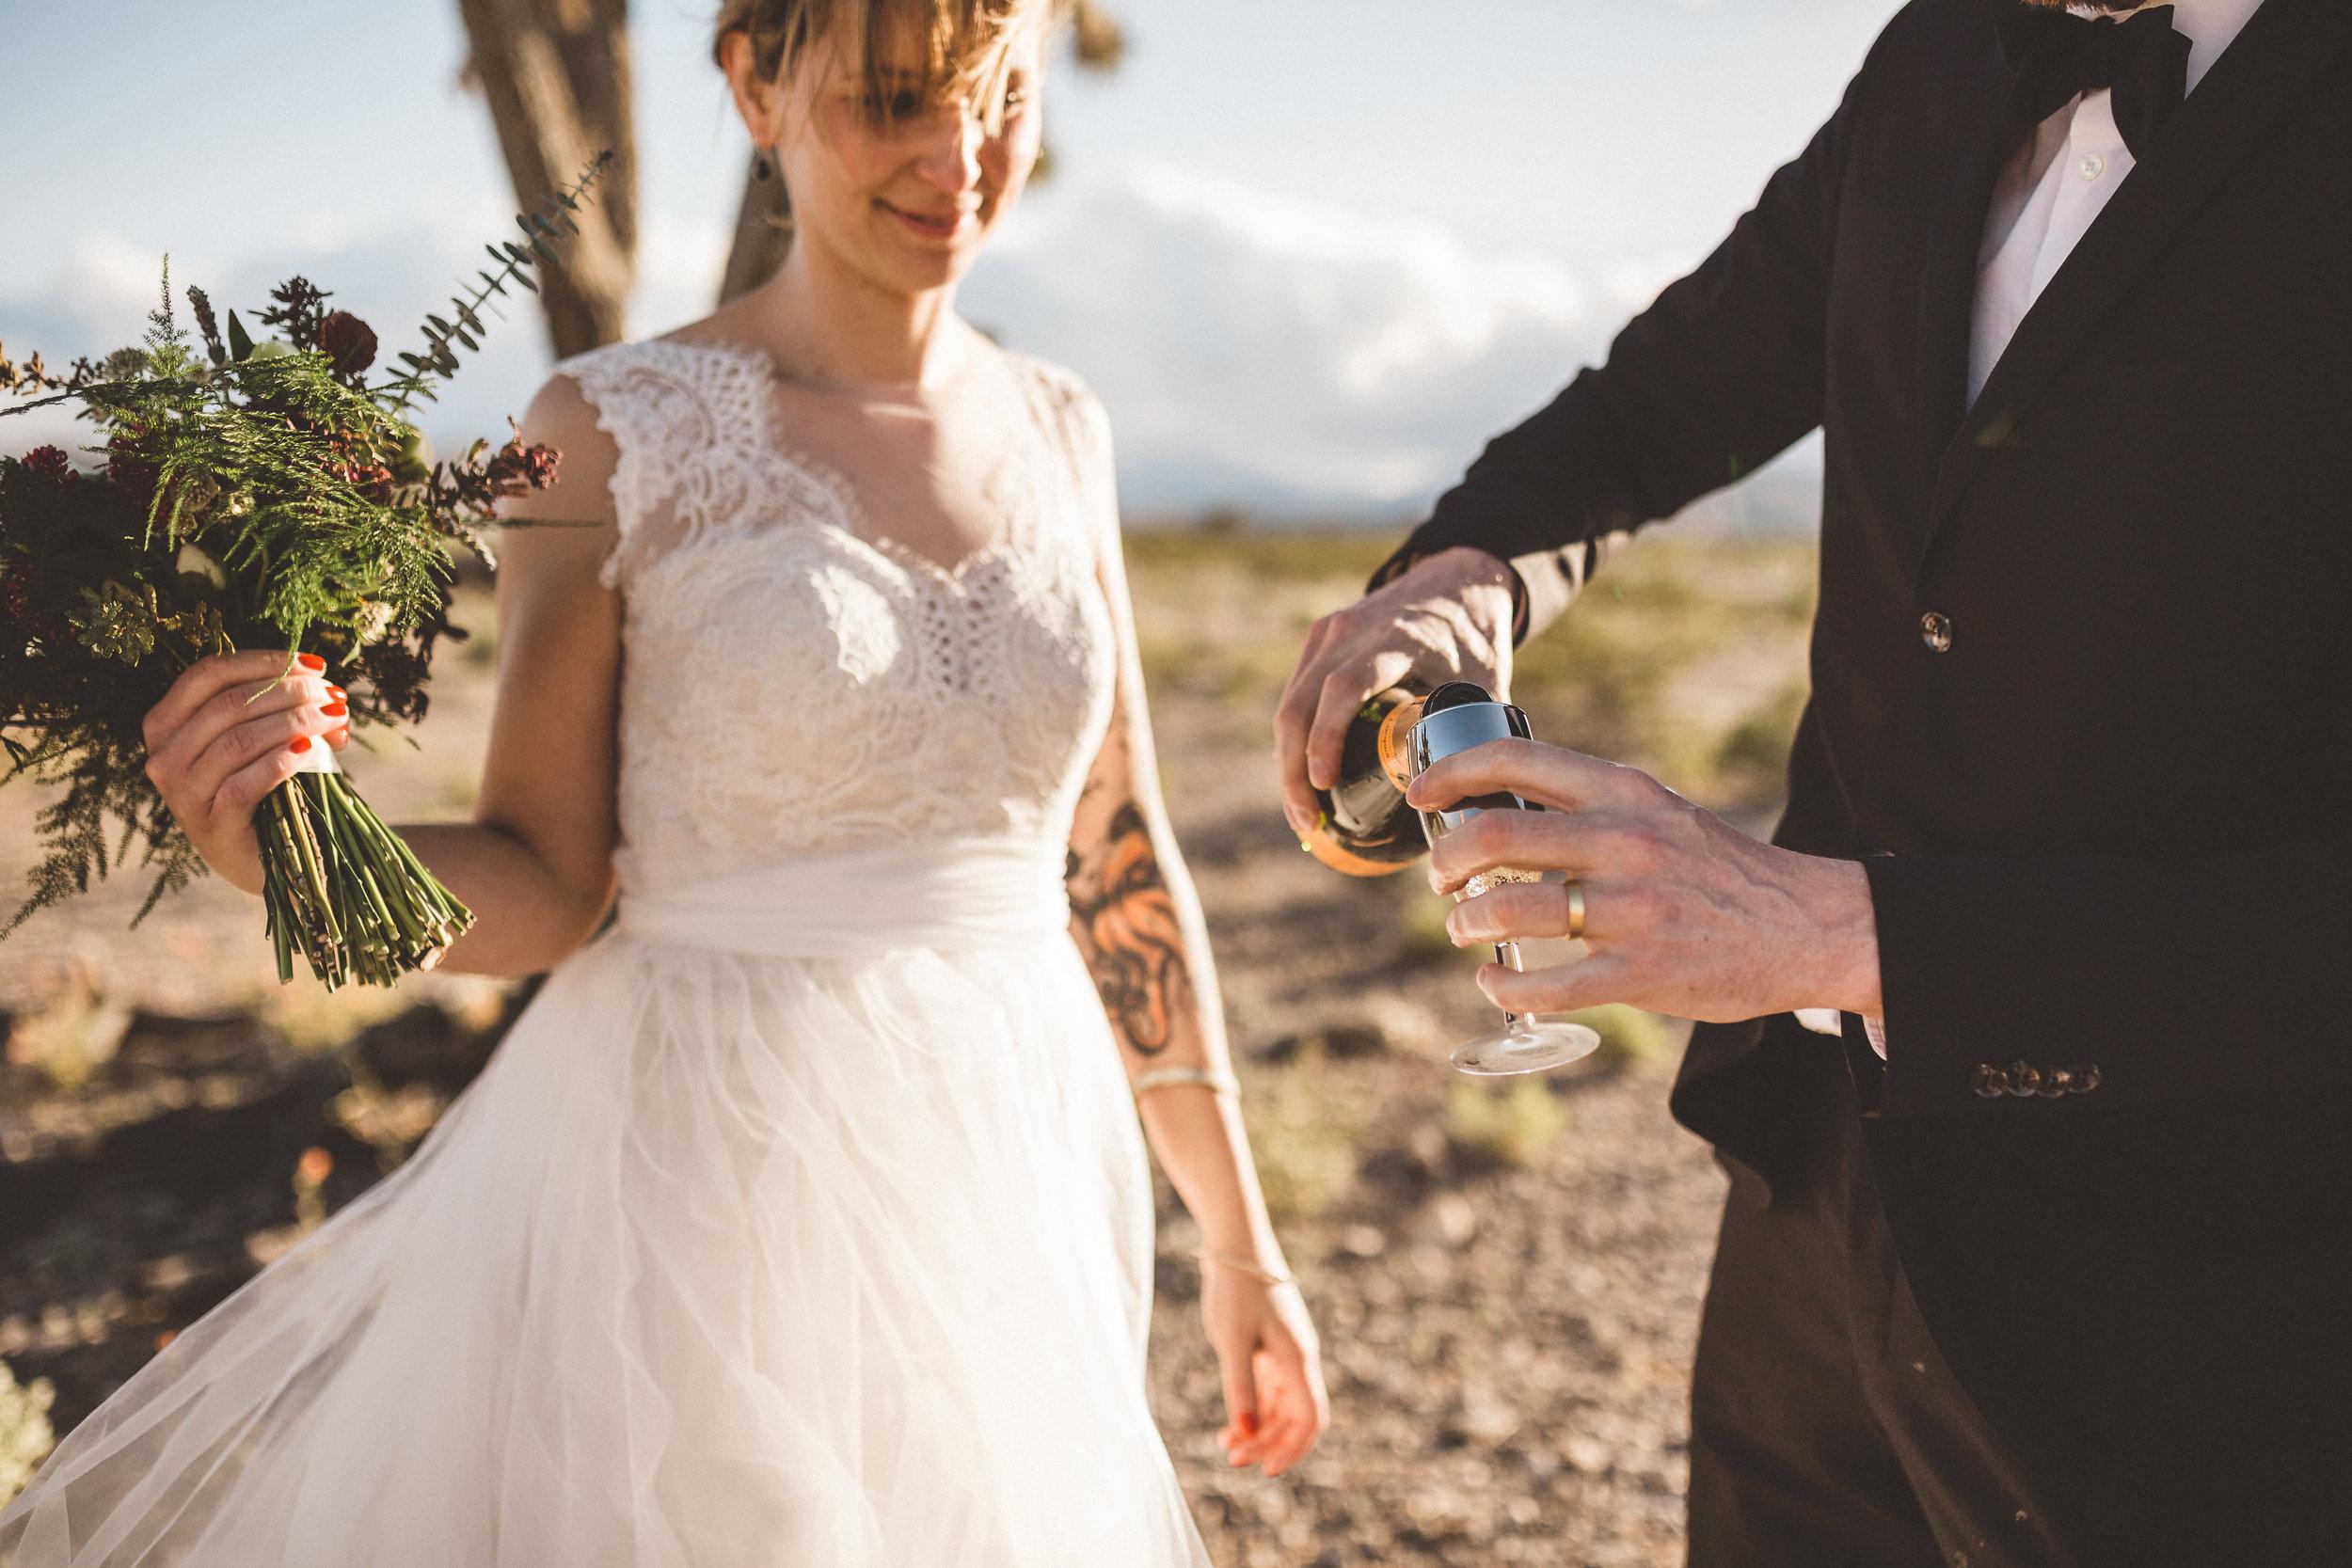 meike-and-rene-las-vegas-desert-elopement7.jpg